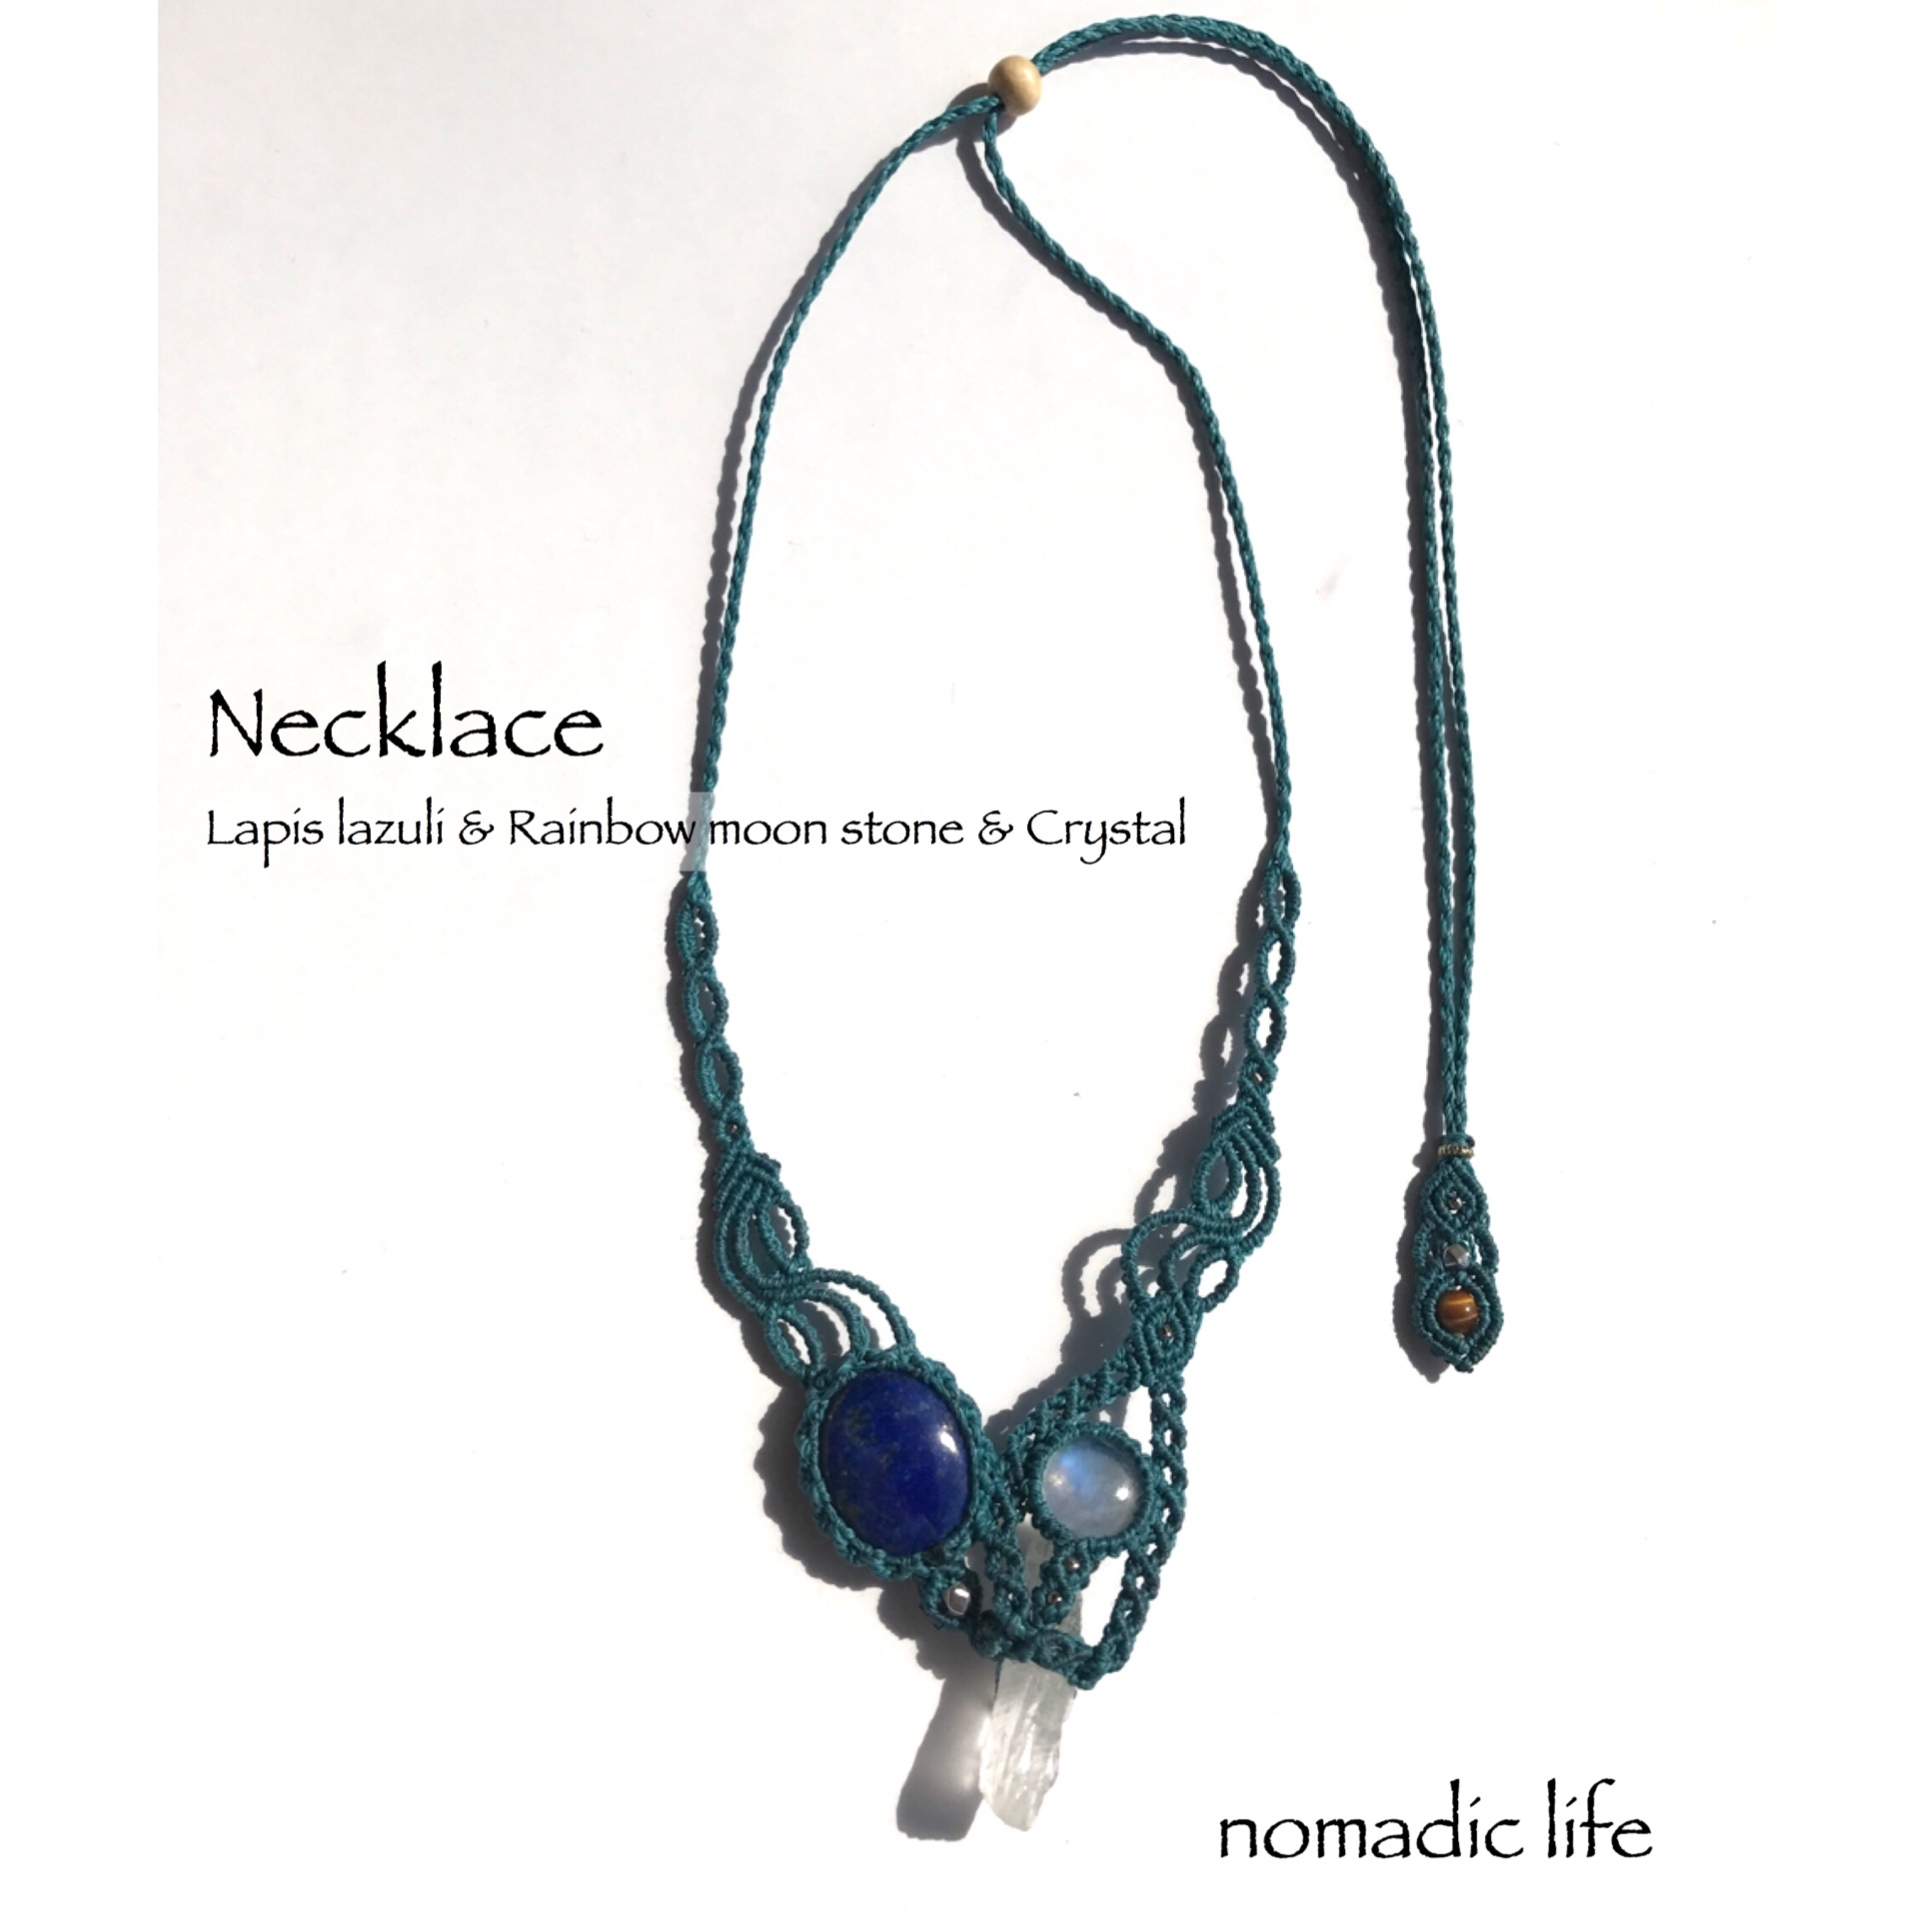 Lapis lazuli & Rainbow moon stone & Crystal Necklace//No.135